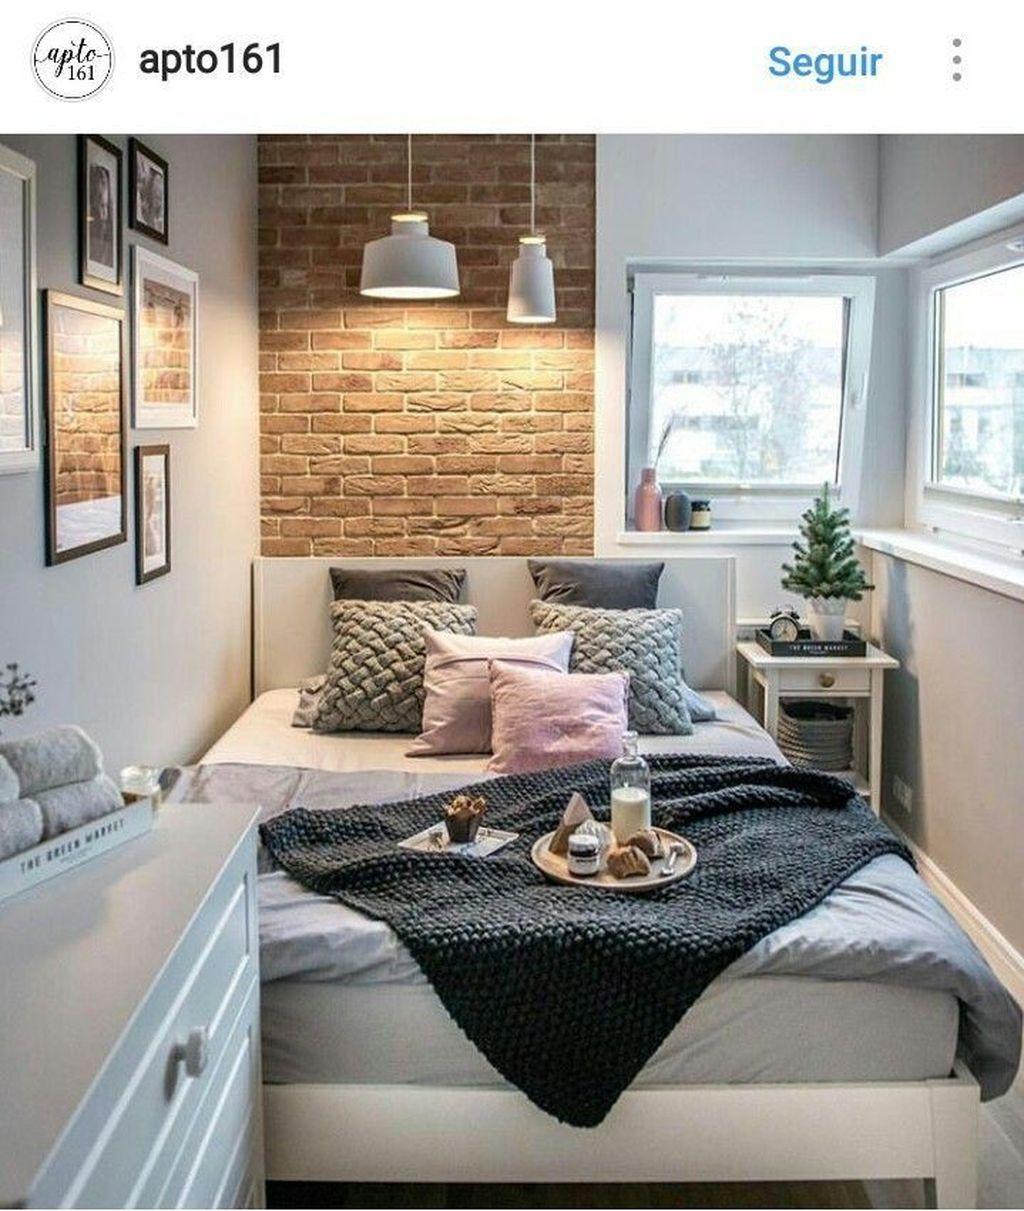 minimalist bedroom design ideas for comfortable home decor